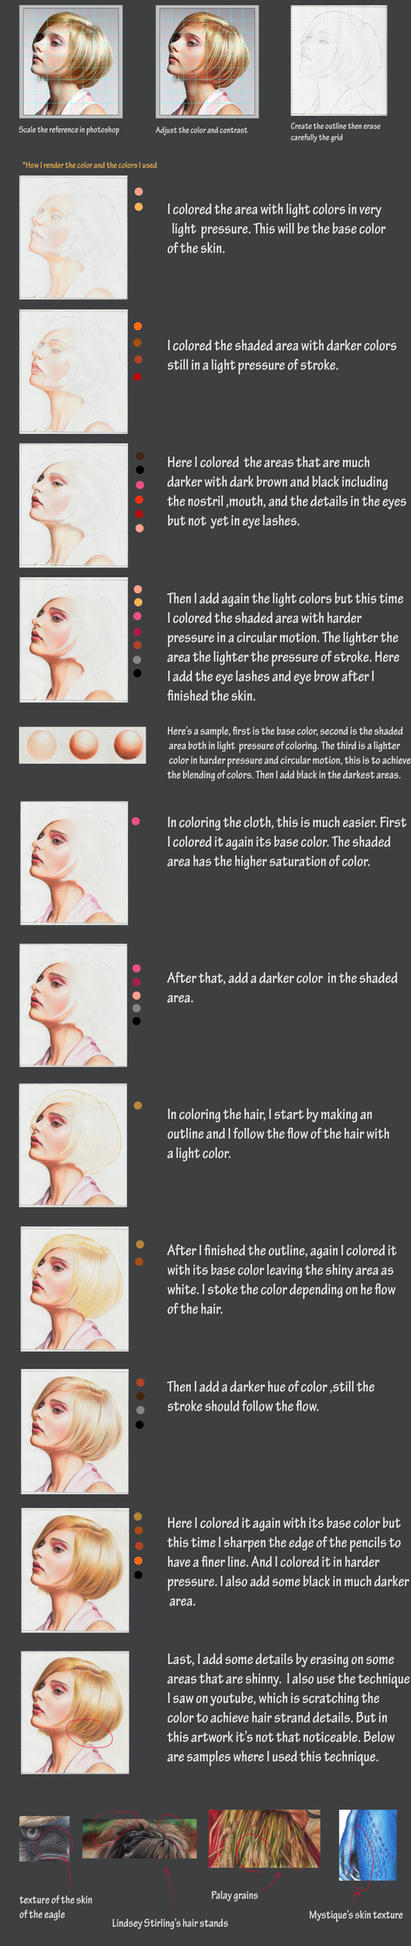 Colored Pencil tutorial by Abremson